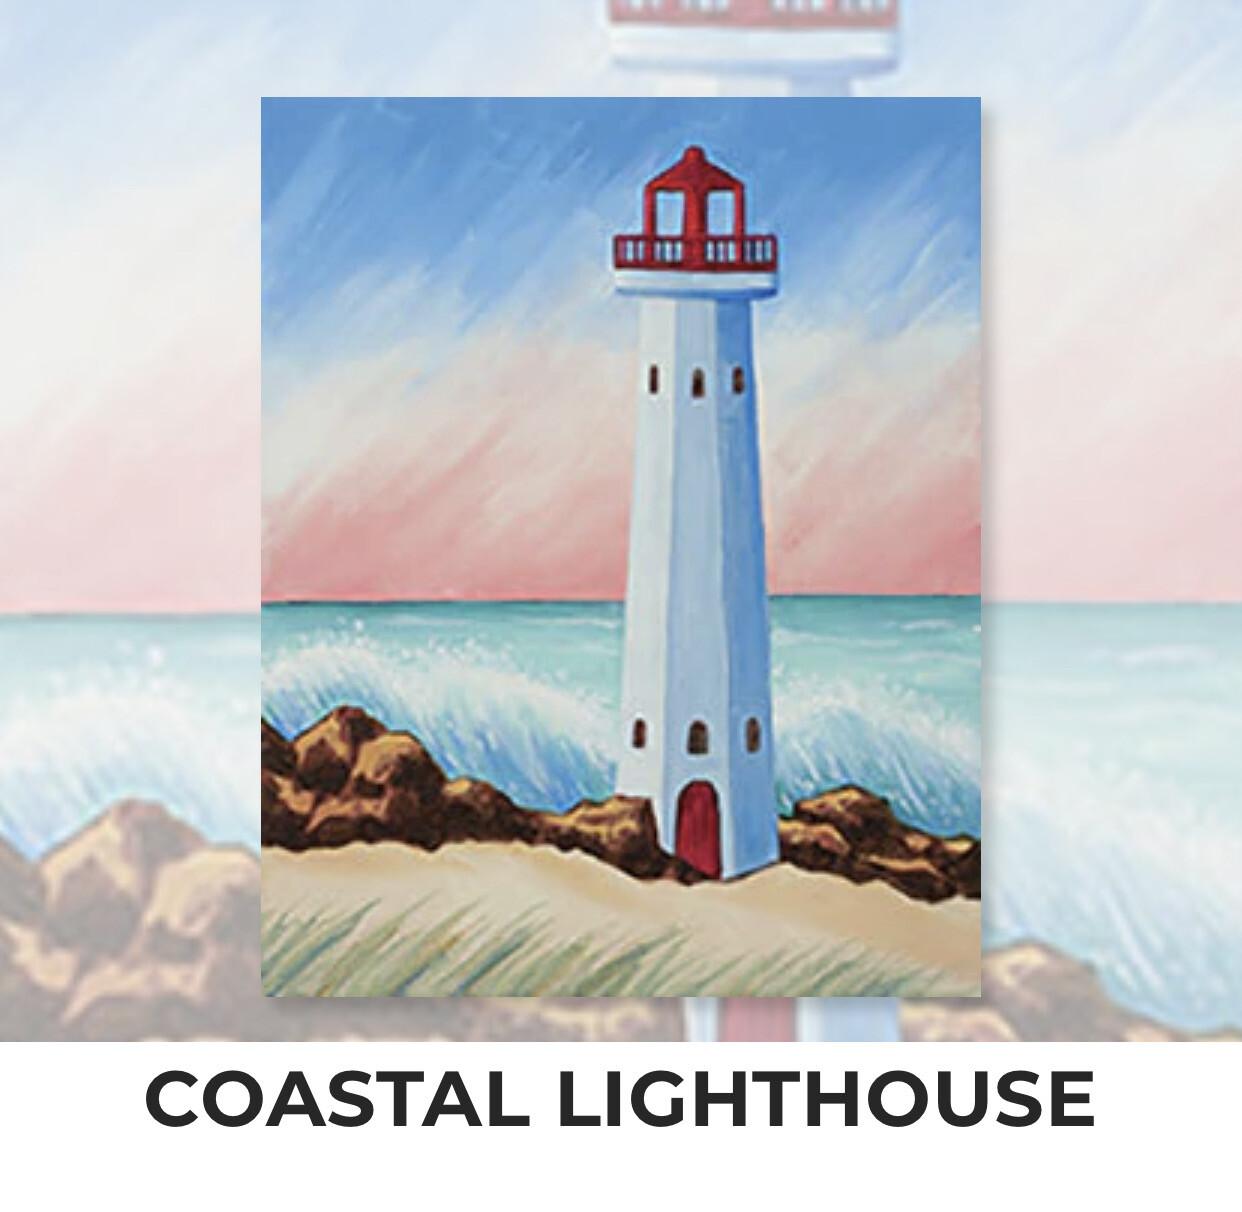 Coastal Lighthouse ADULT Acrylic Paint On Canvas DIY Art Kit - 3 Week Special Order